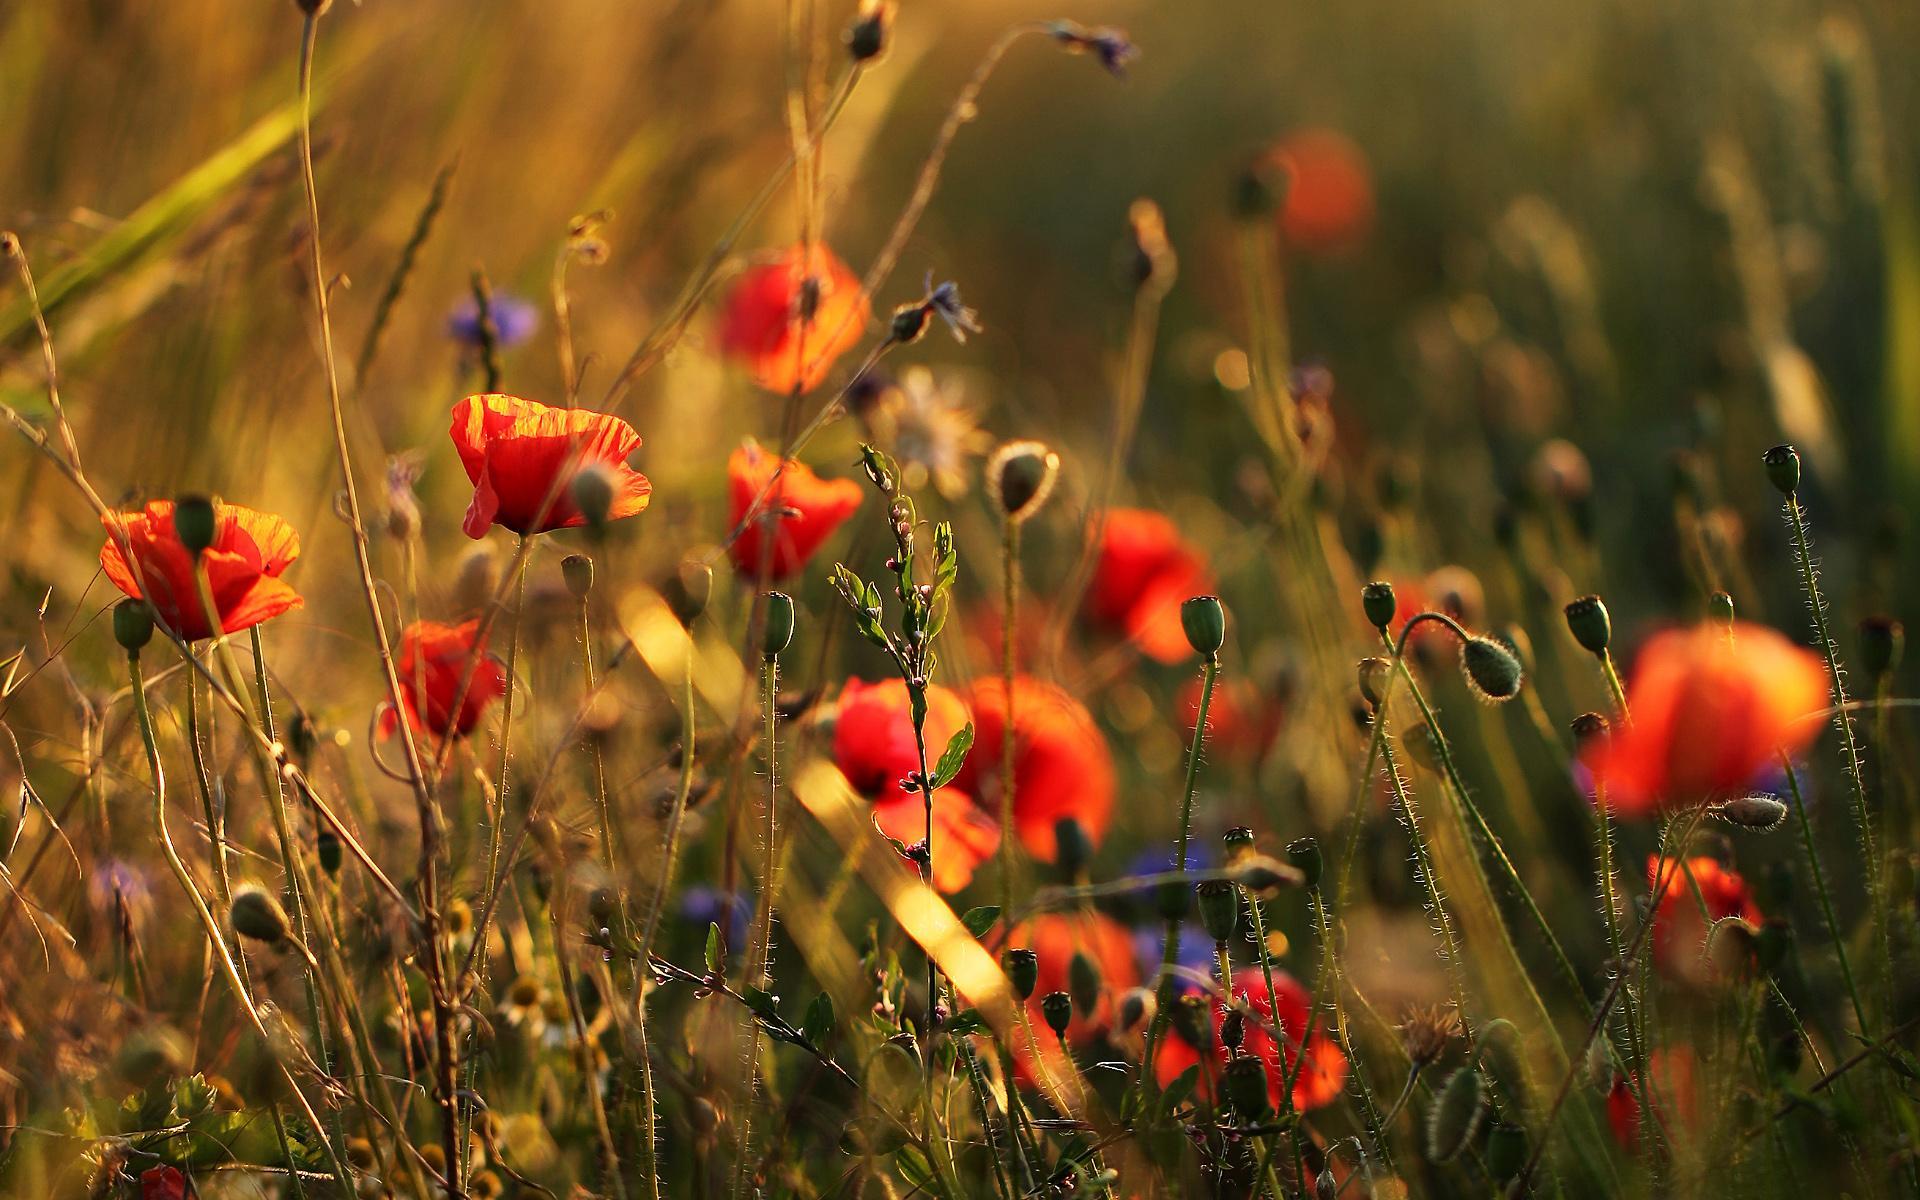 Cute Poppy 1080p Wallpaper Blumenwiese Wallpaper Nature And Landscape Wallpaper